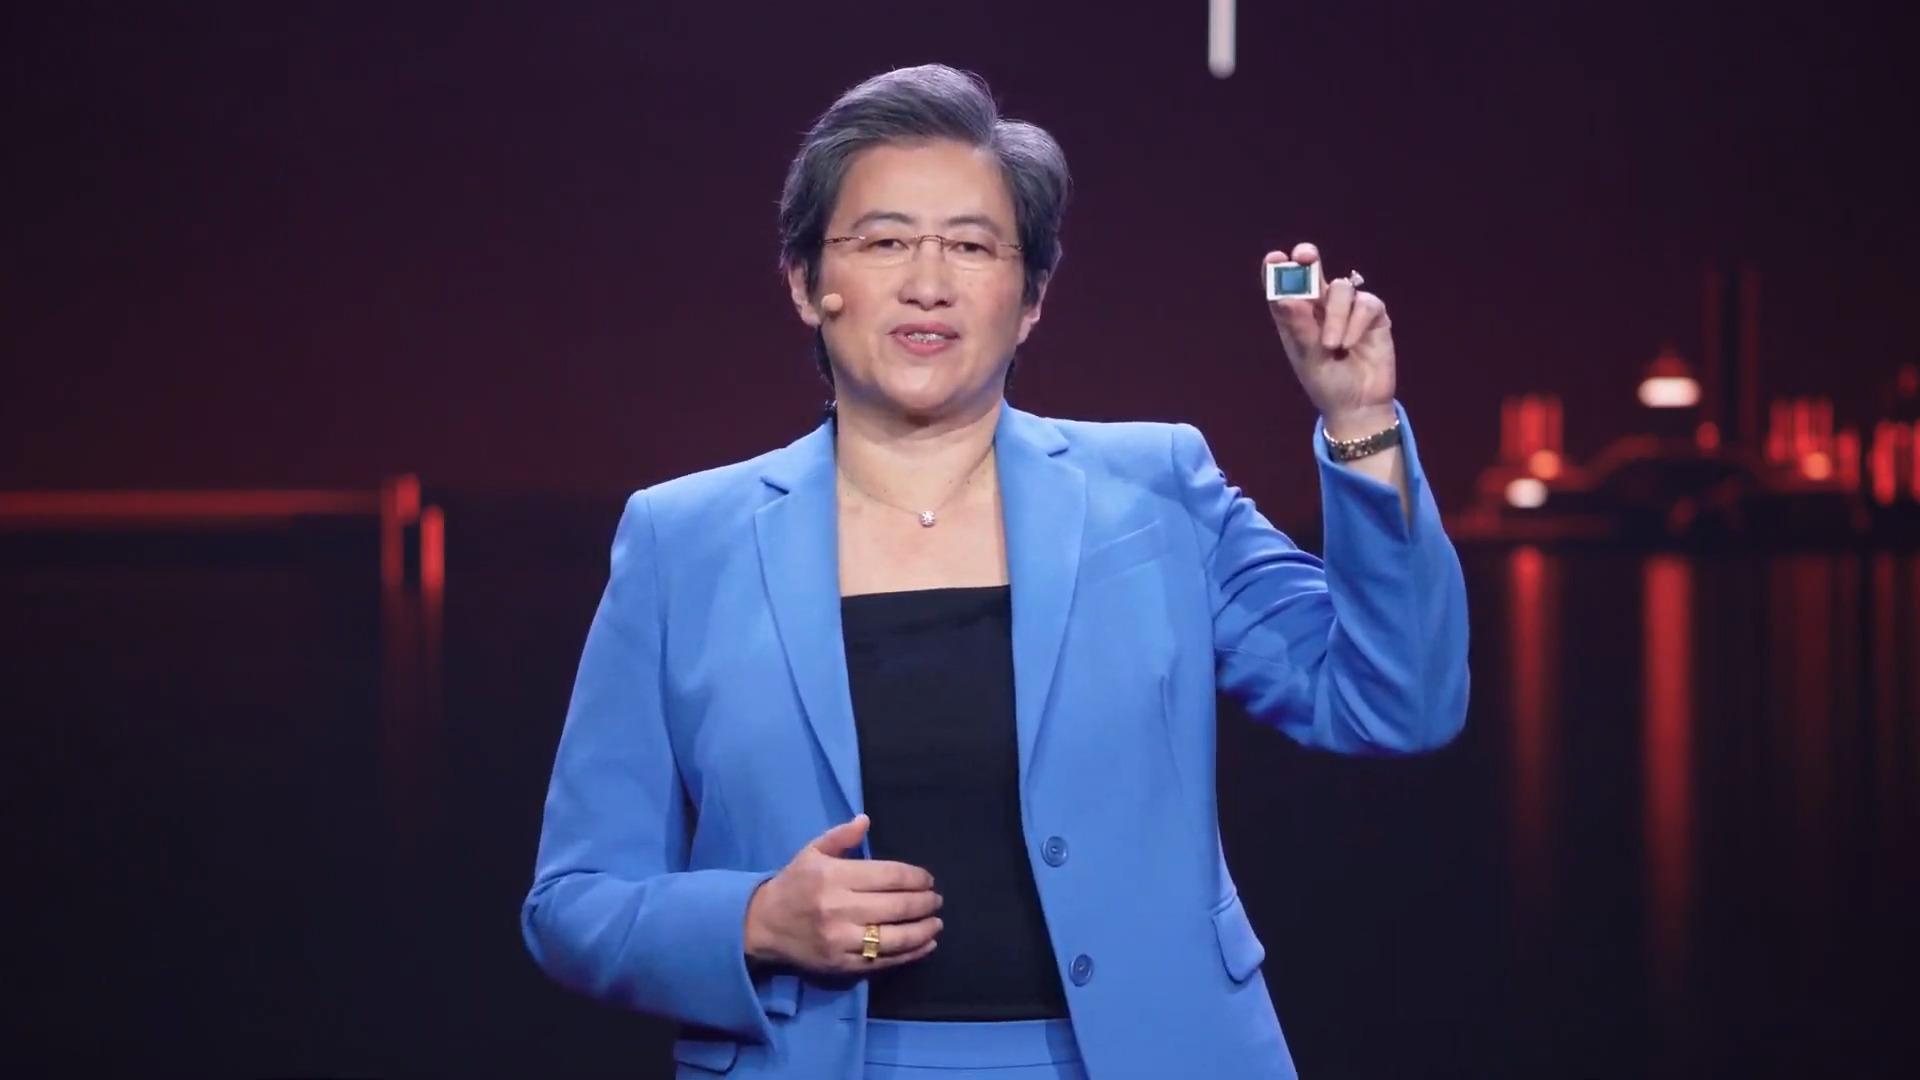 AMD Ryzen 5000 Mobile Series - Introduction